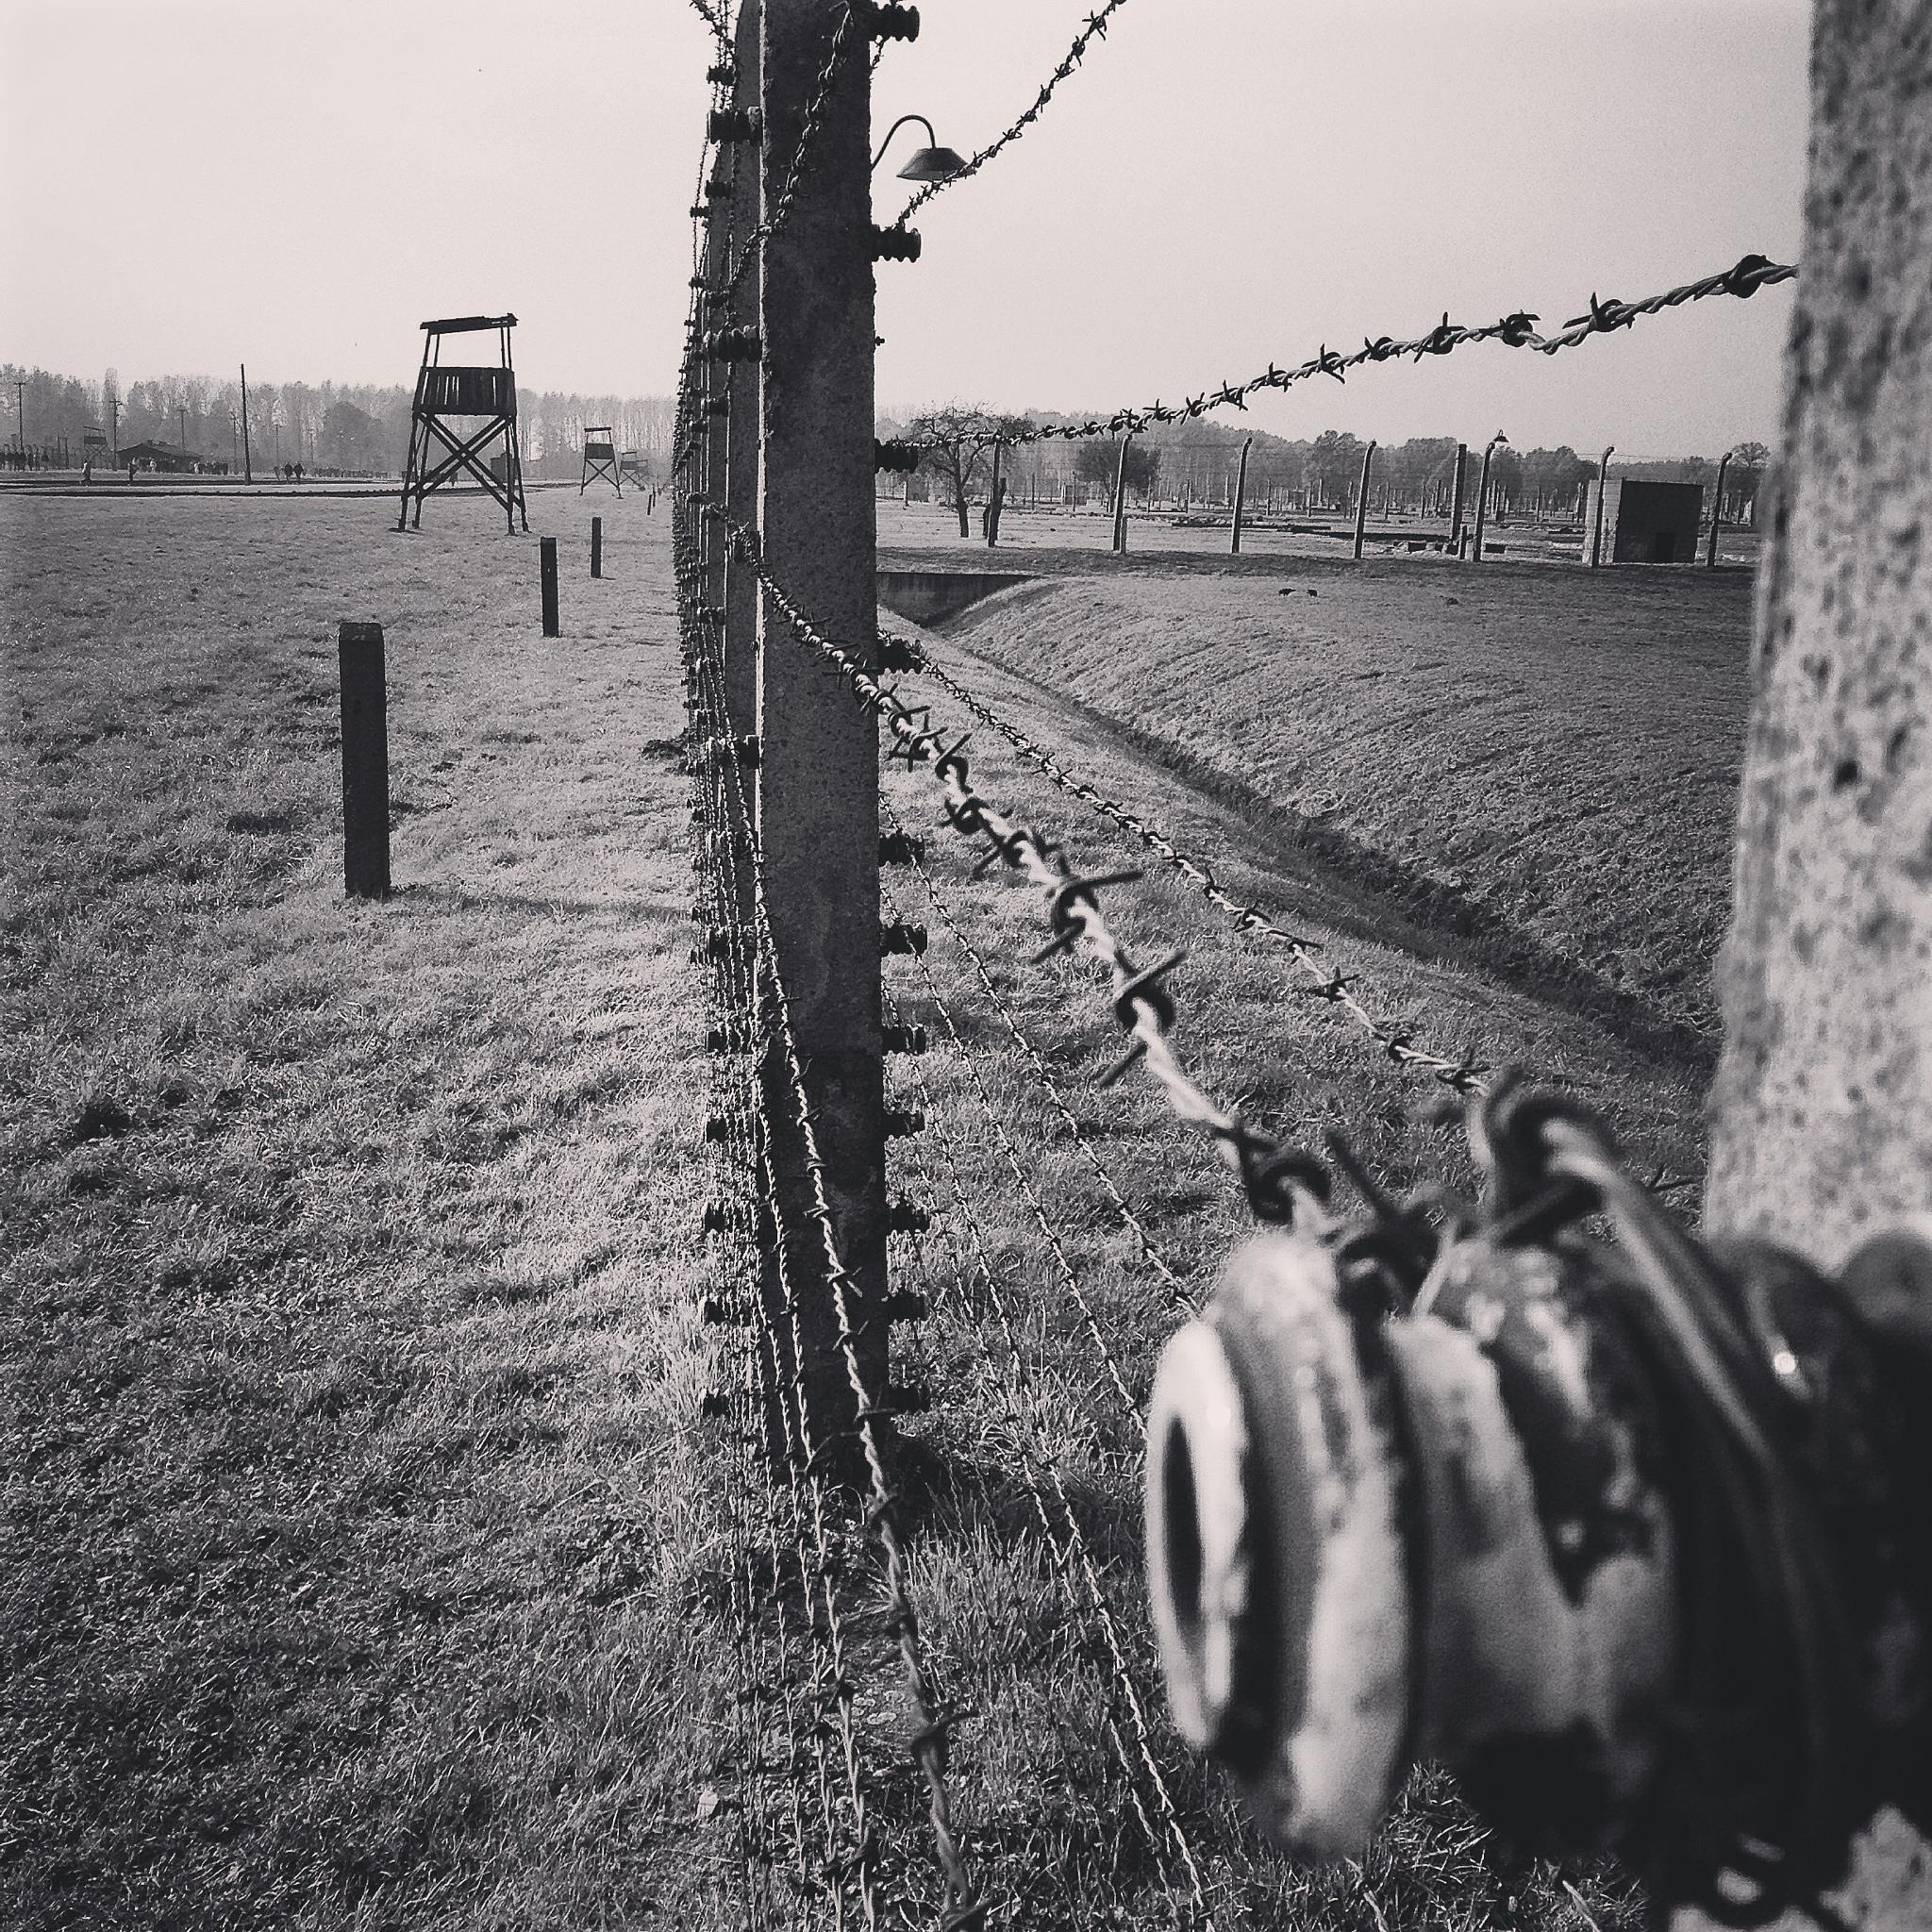 Fences of tragedy by Thomas Ryste